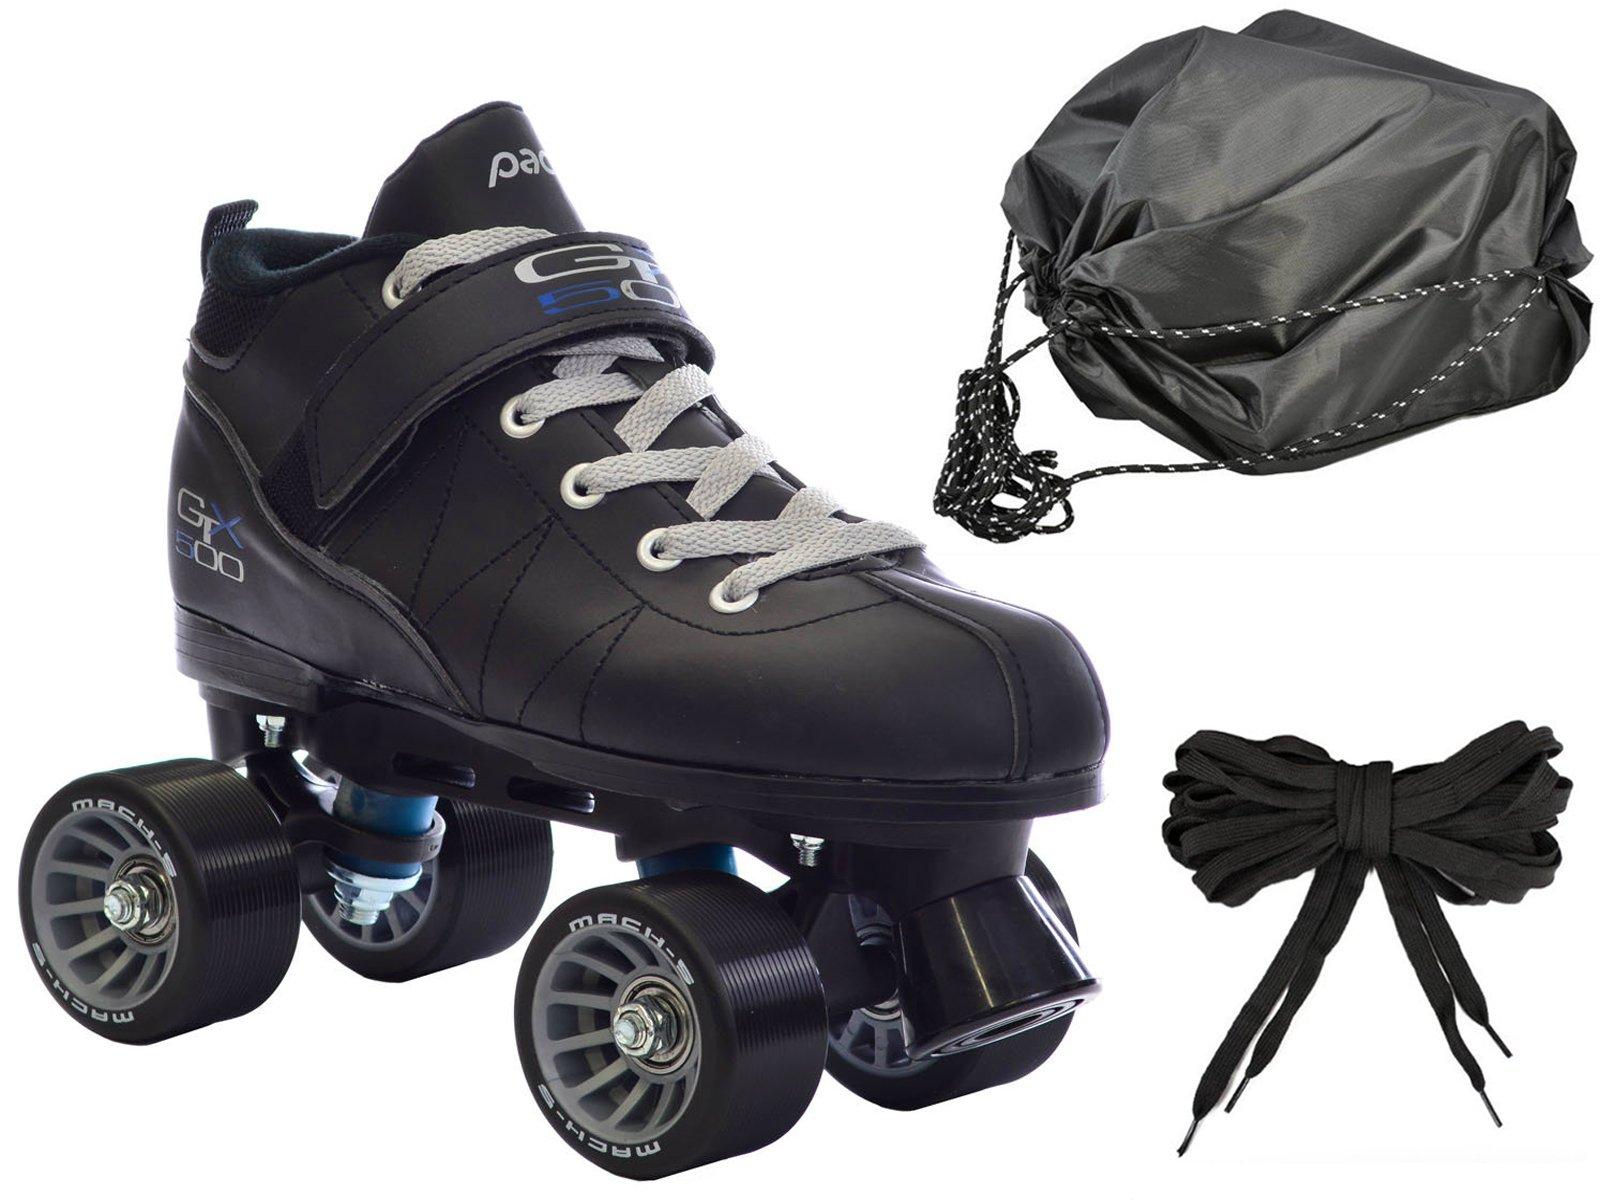 Black Mach-5 GTX500 Quad Speed Roller Skates w/ 2 Pair of Laces (Gray & Black) + Drawstring Bag! (Mens 10)